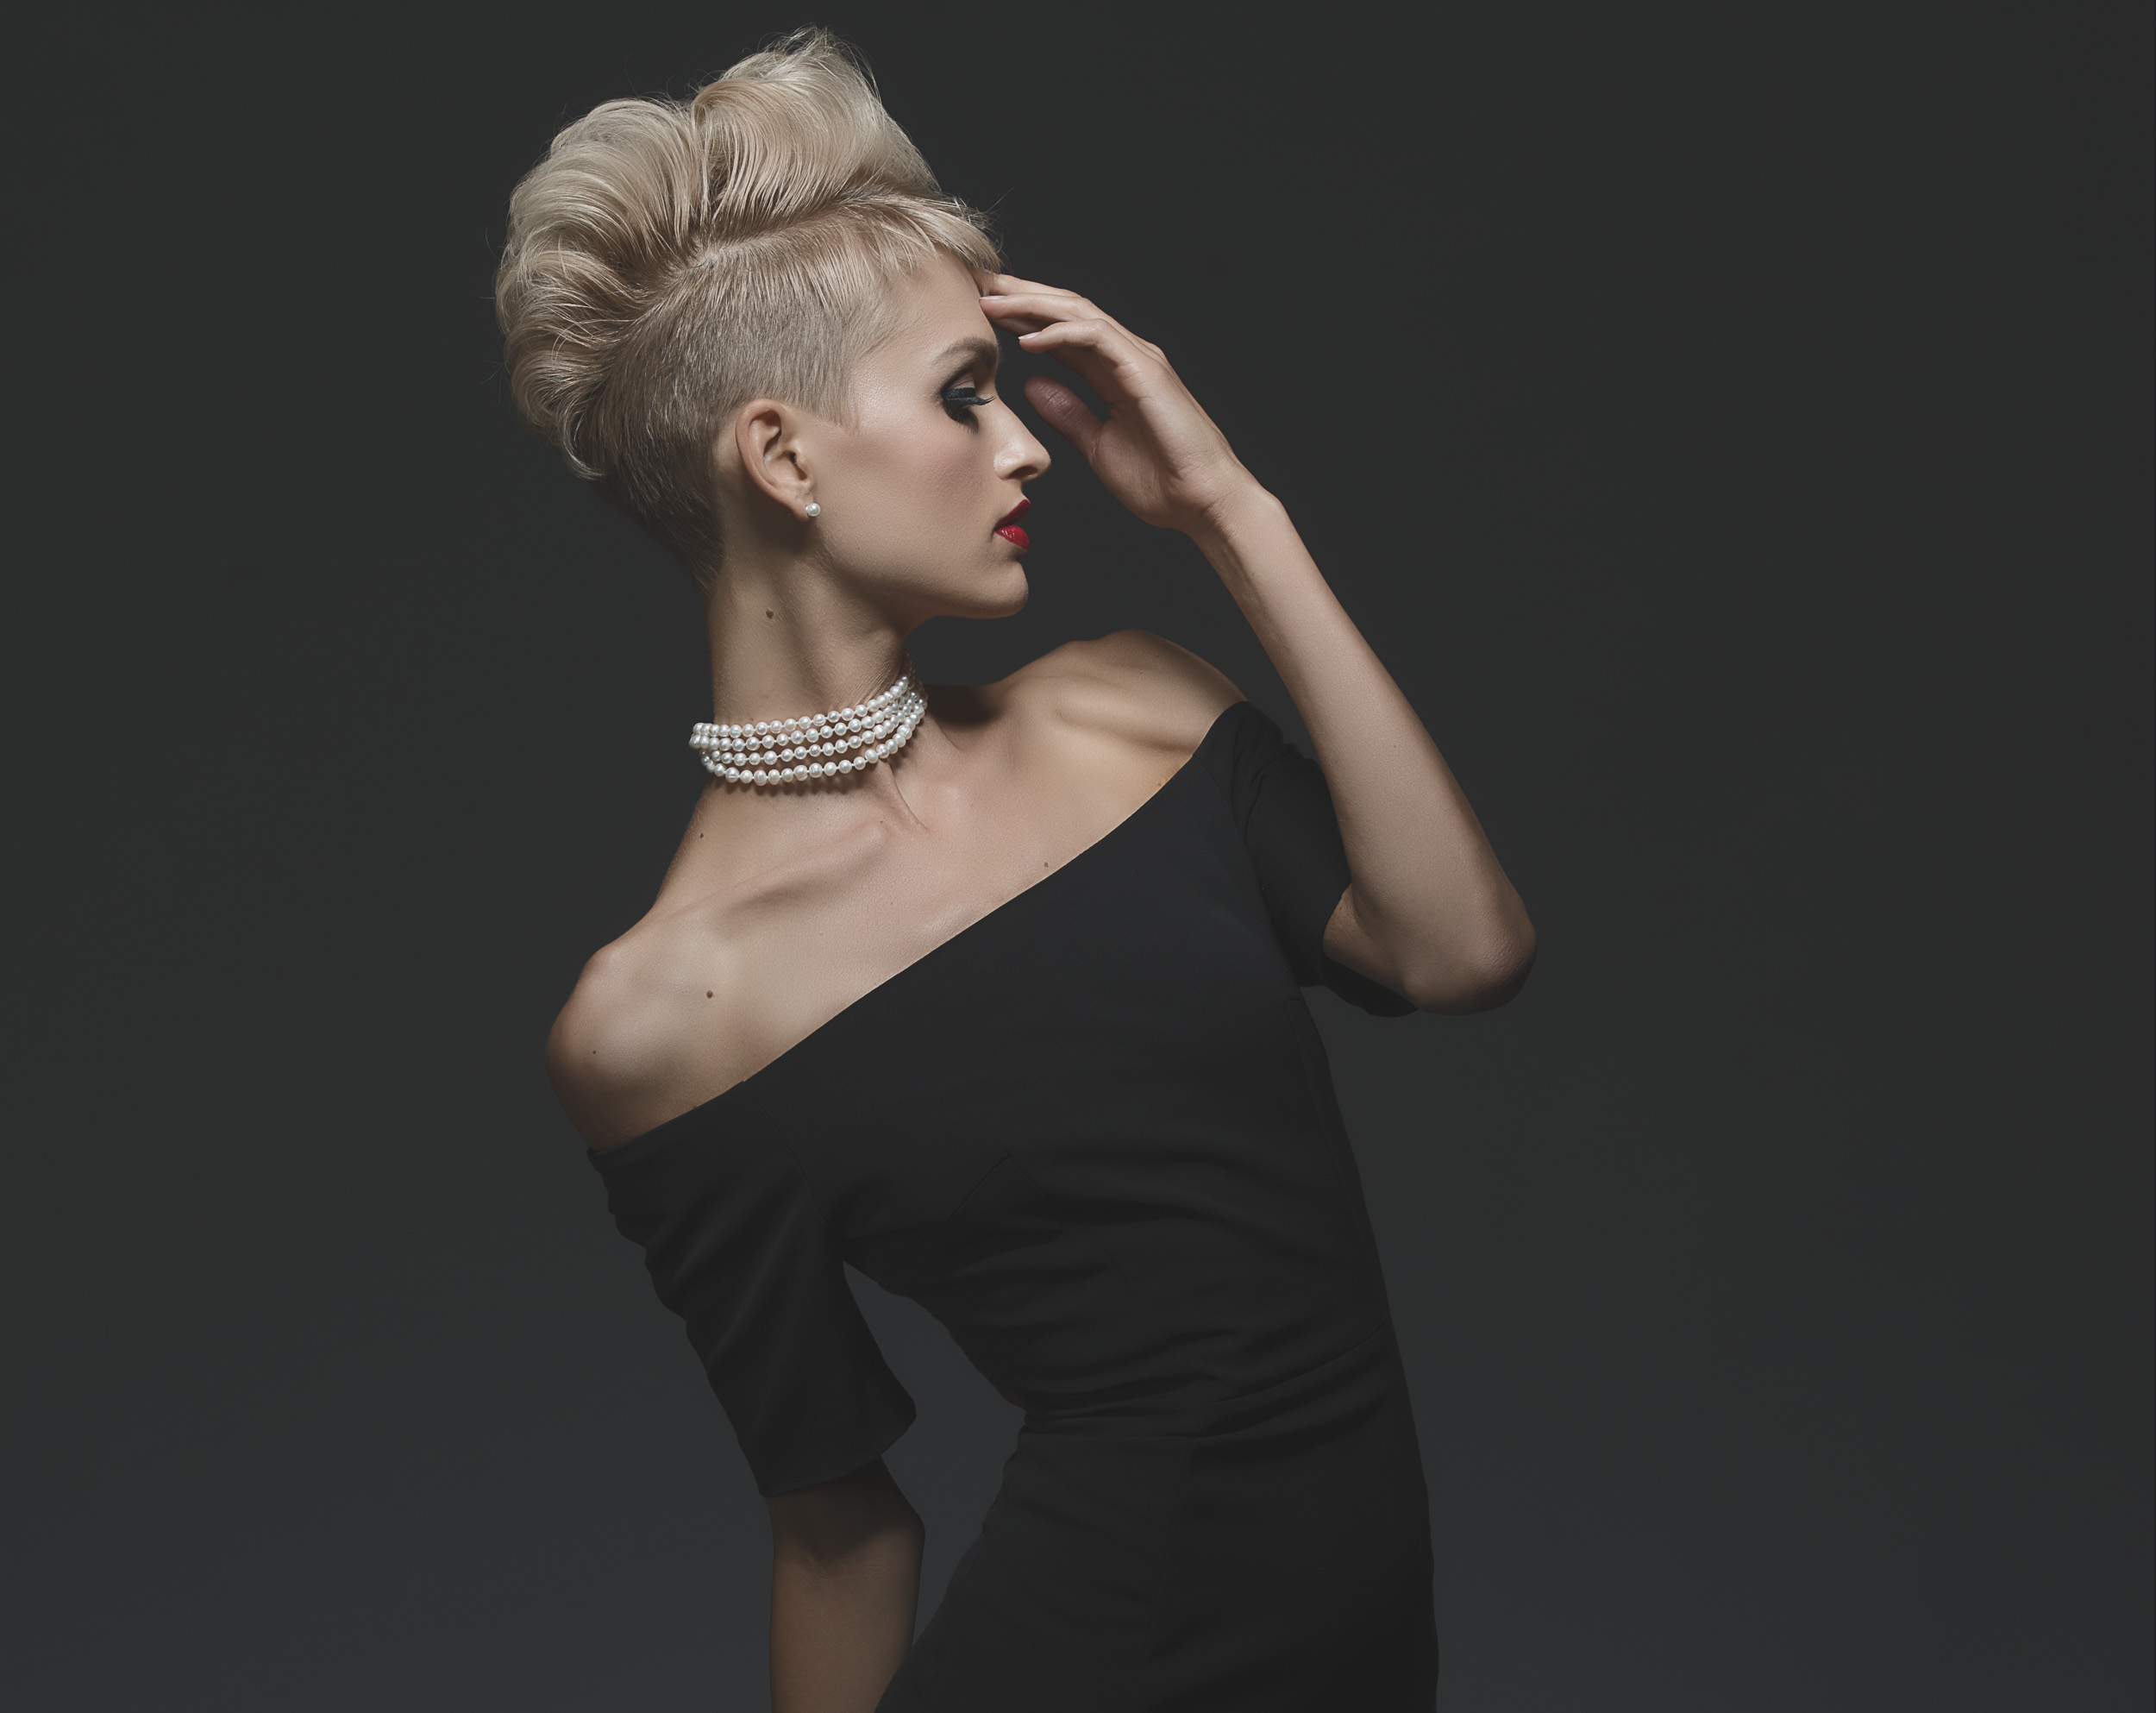 Dark Fashion Portraits Shannon Fabry , Paul Davis III